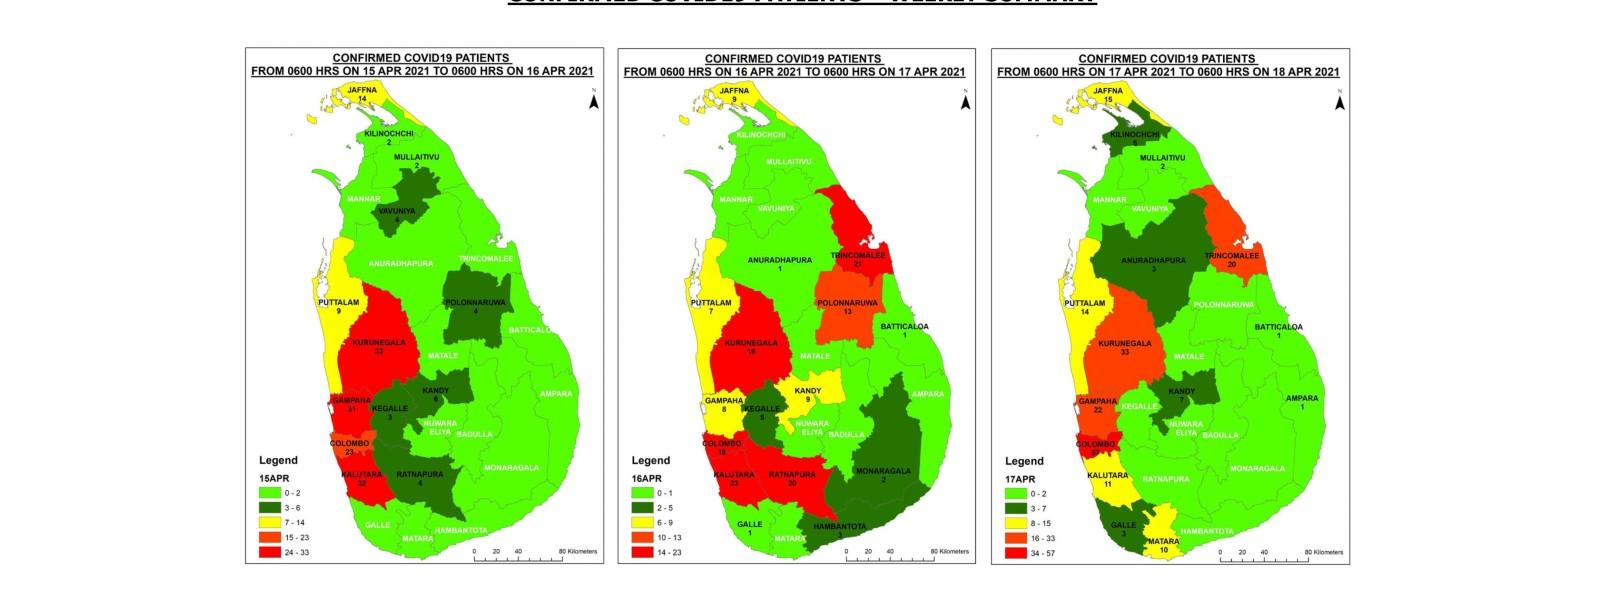 4,090 COVID-19 cases reported from Sri Lanka in April 2021